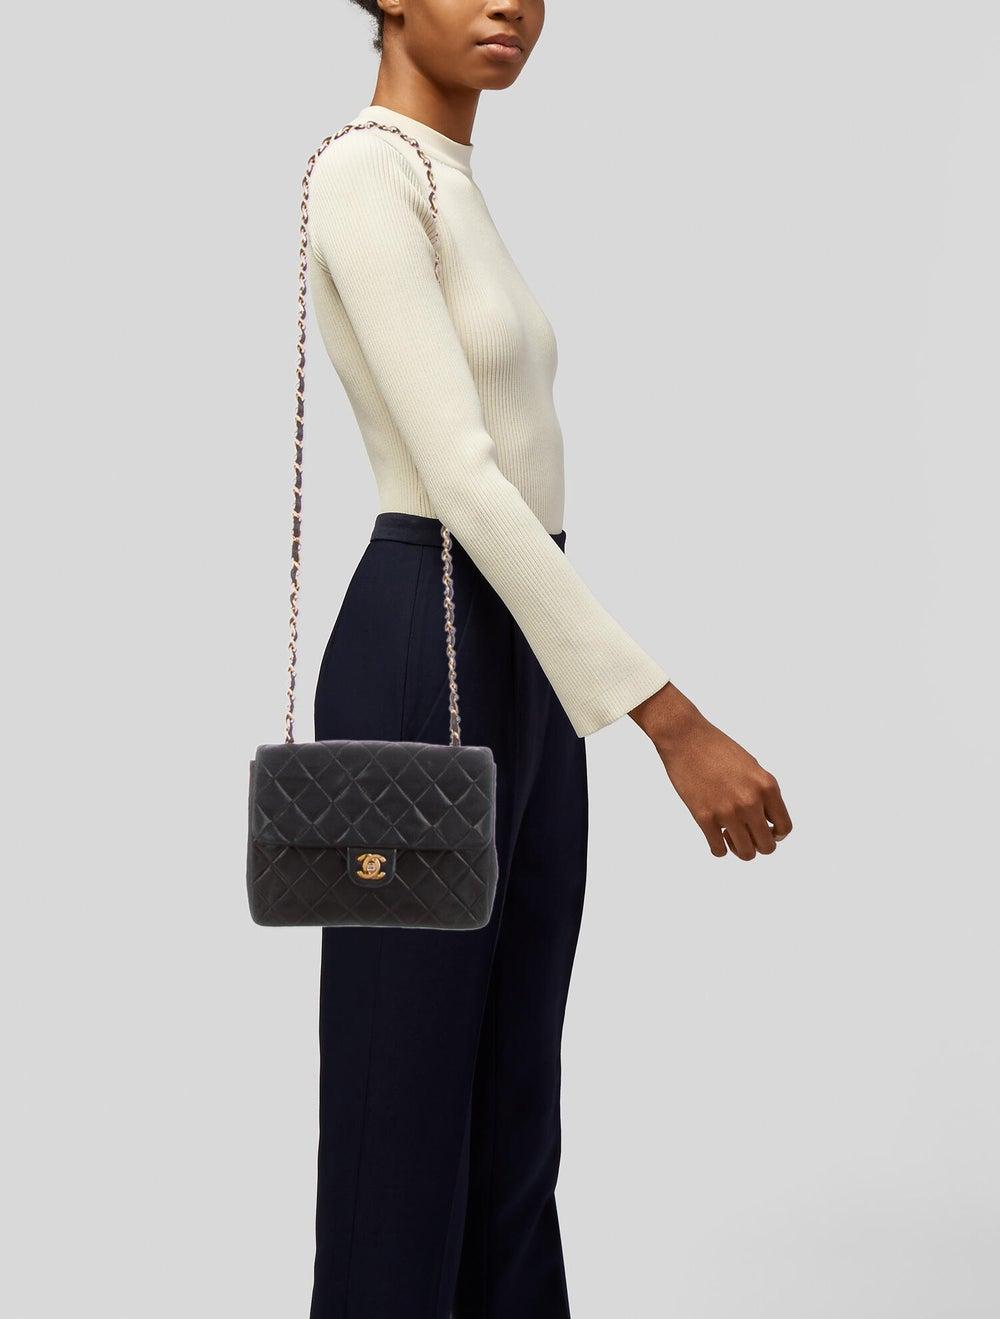 Chanel Vintage Classic Small Single Flap Bag Blue - image 2